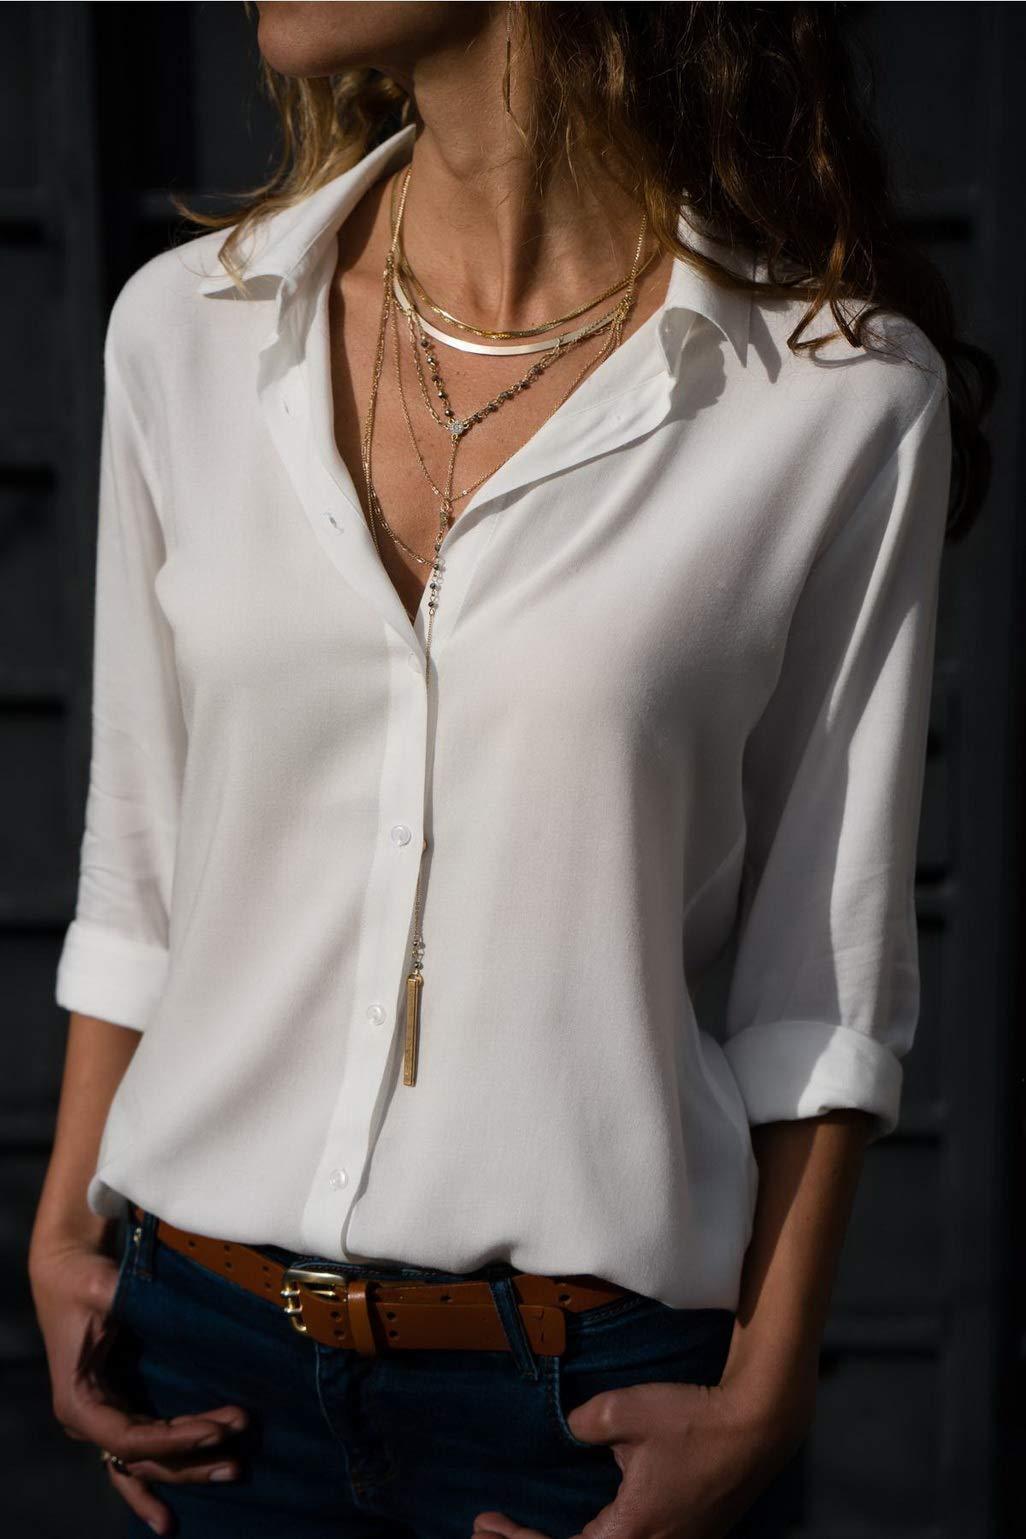 Fafalisa Autumn Tops Blouses Women Elegant Long Sleeve Solid V-Neck Chiffon Blouse Wear Shirts Plus Size(White,XXXL)